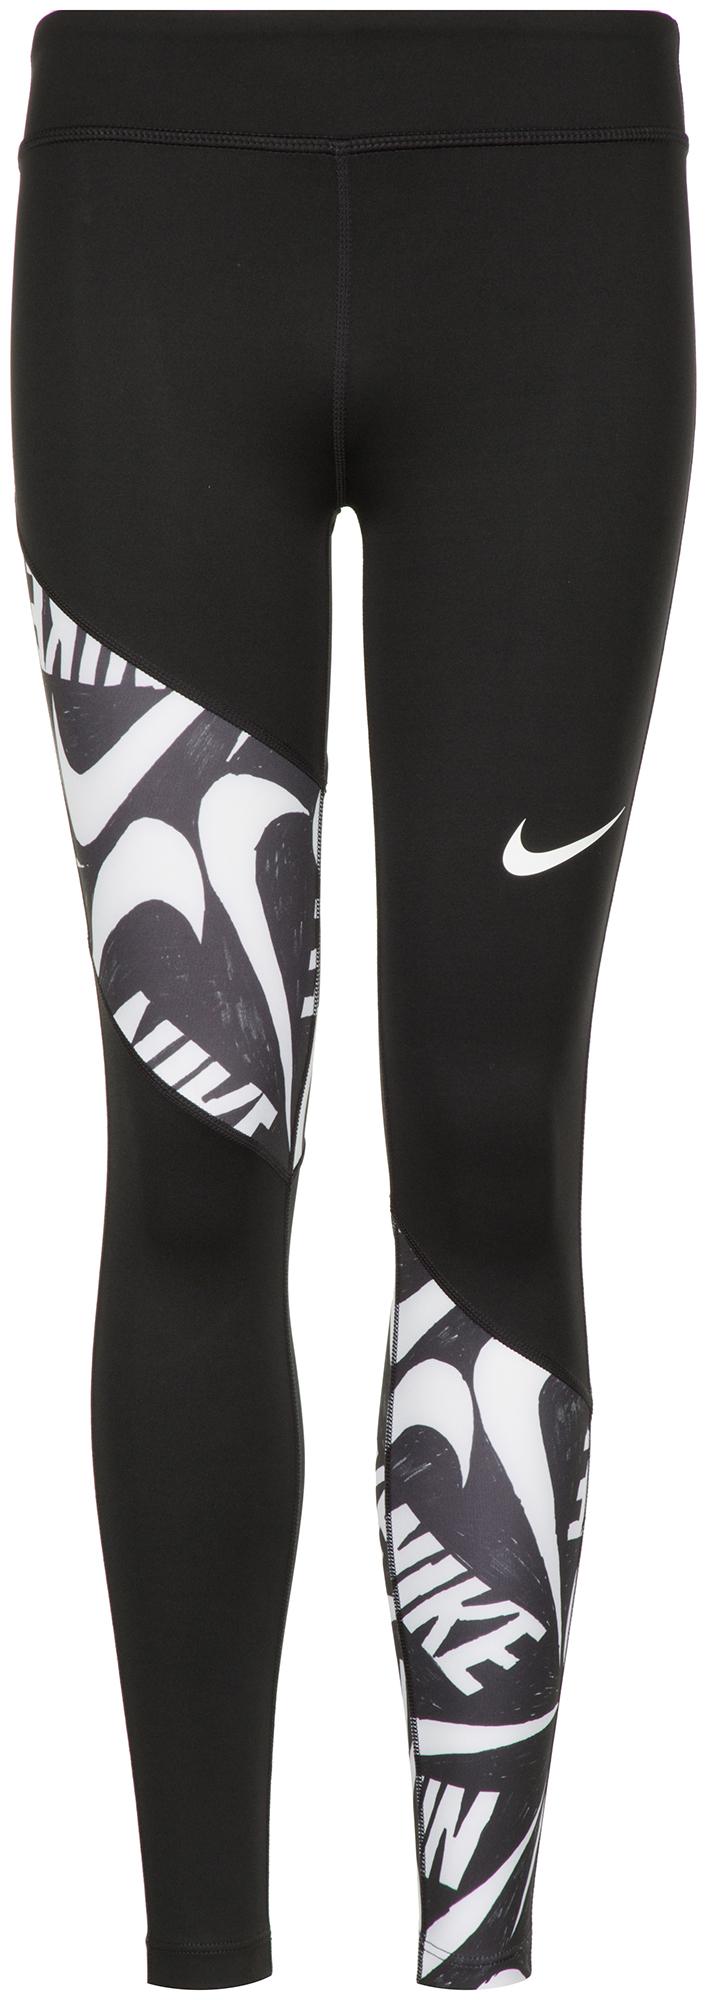 цена на Nike Легинсы для девочек Nike Trophy, размер 156-164